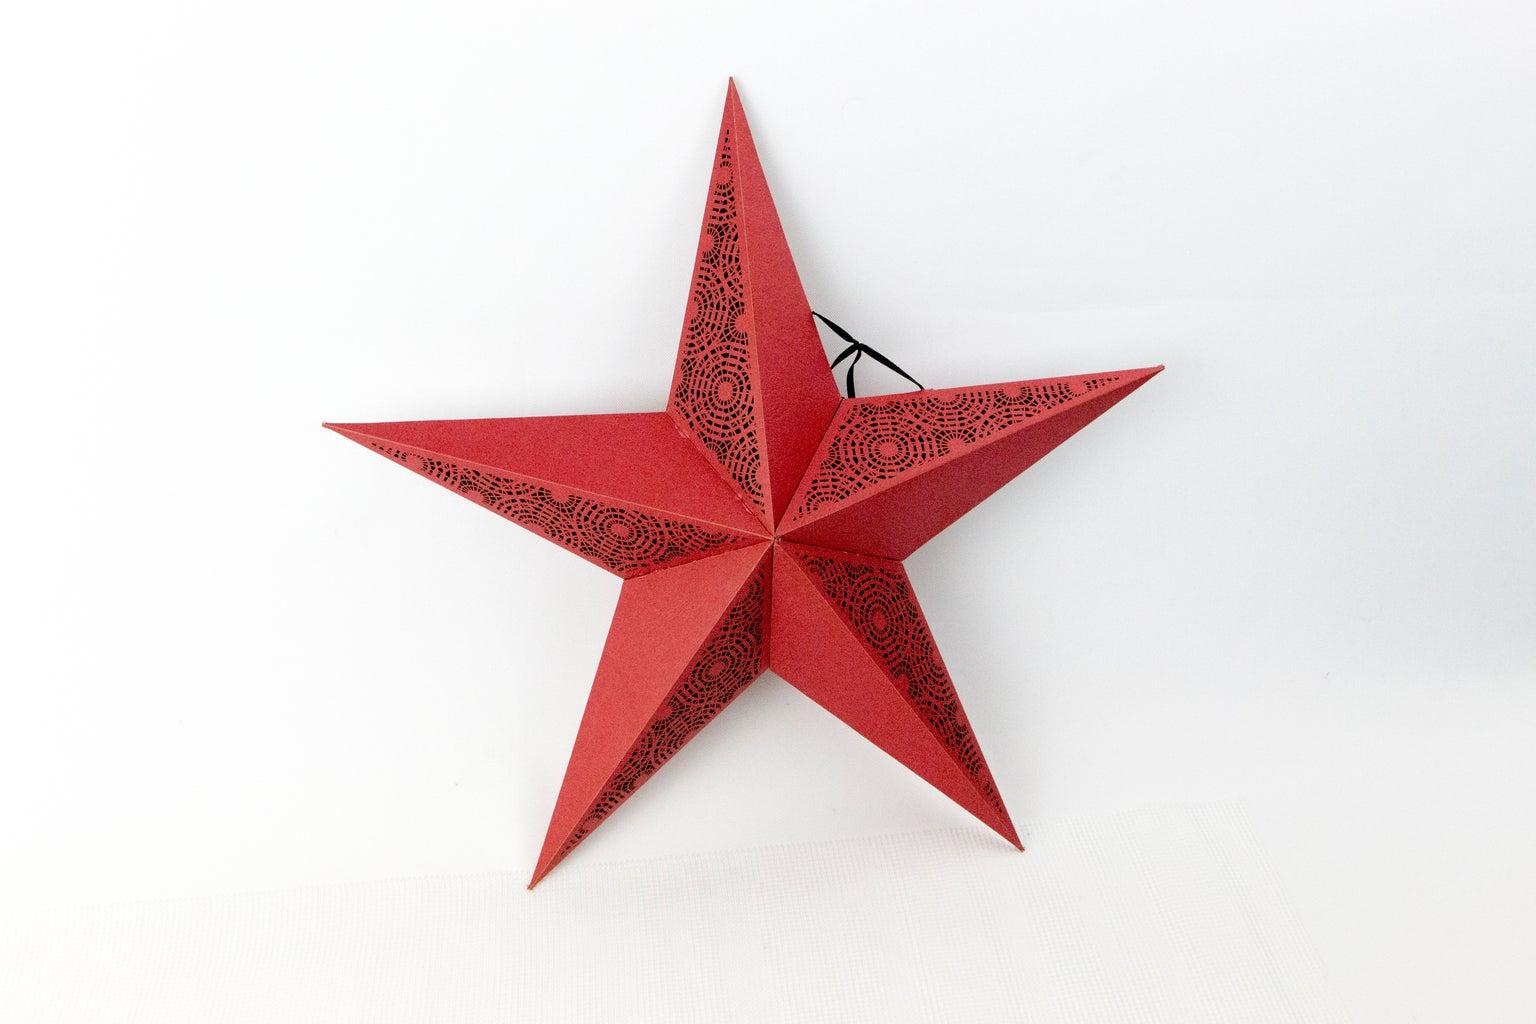 Paper Star Lantern With an Emblaser